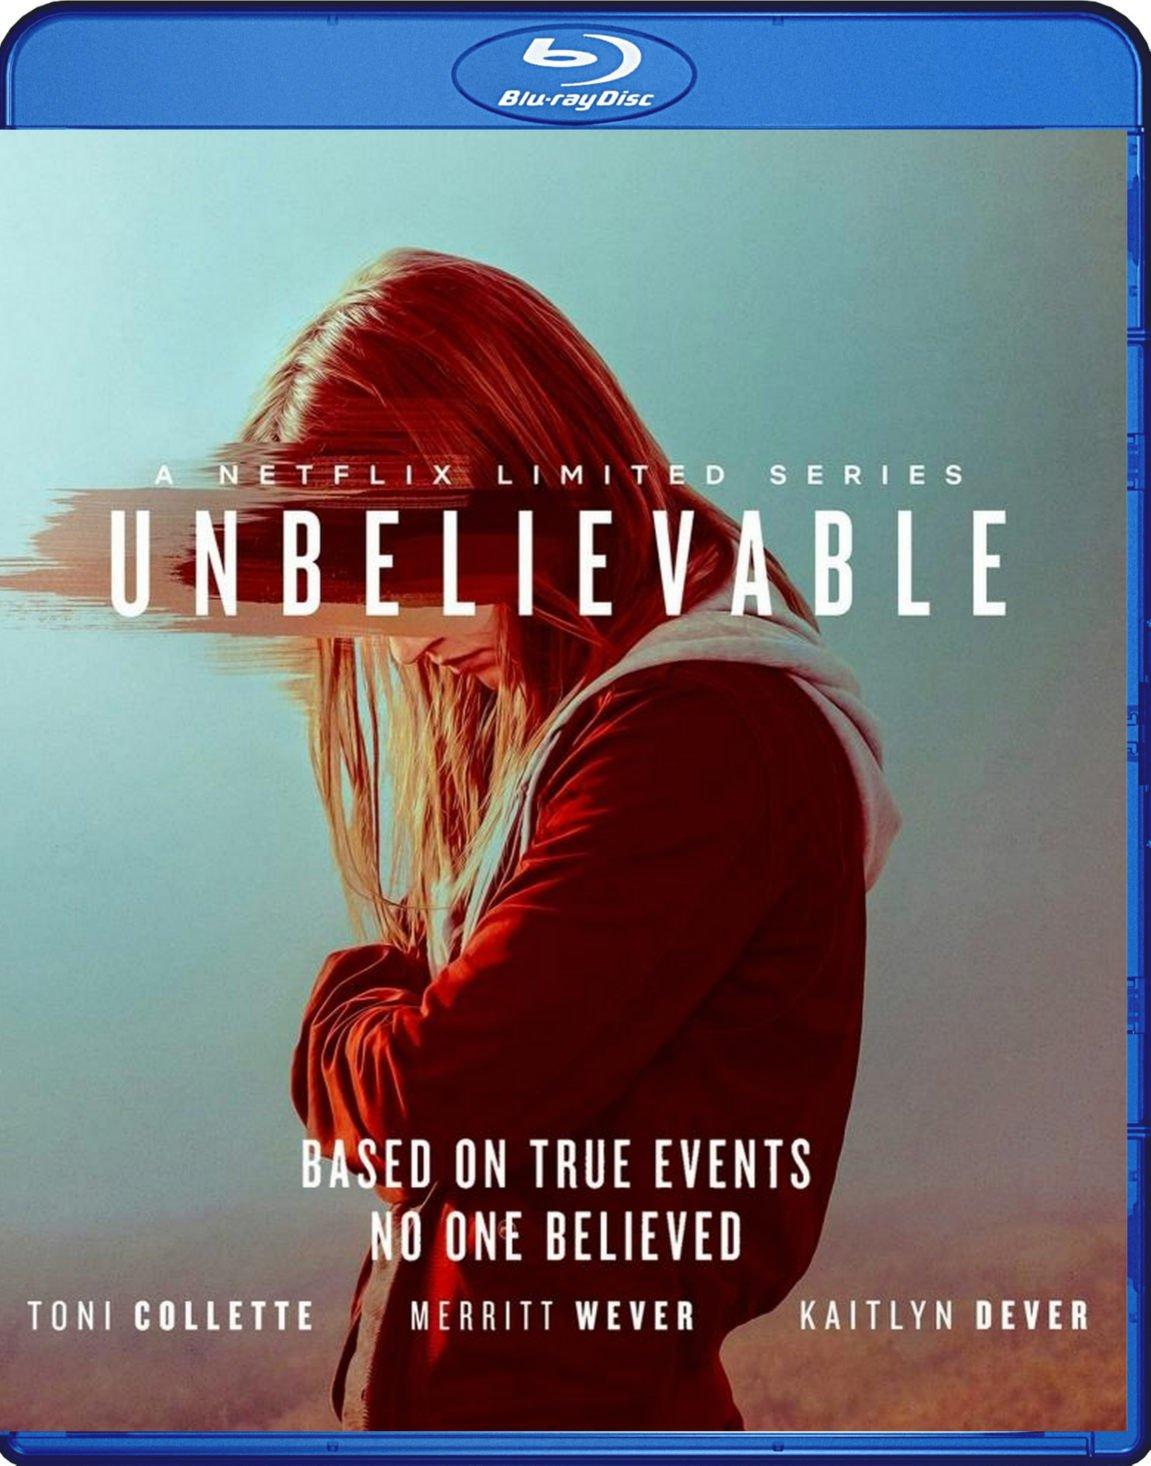 Unbelievable Complete Season Blu-Ray 2BD set Netflix TV Series